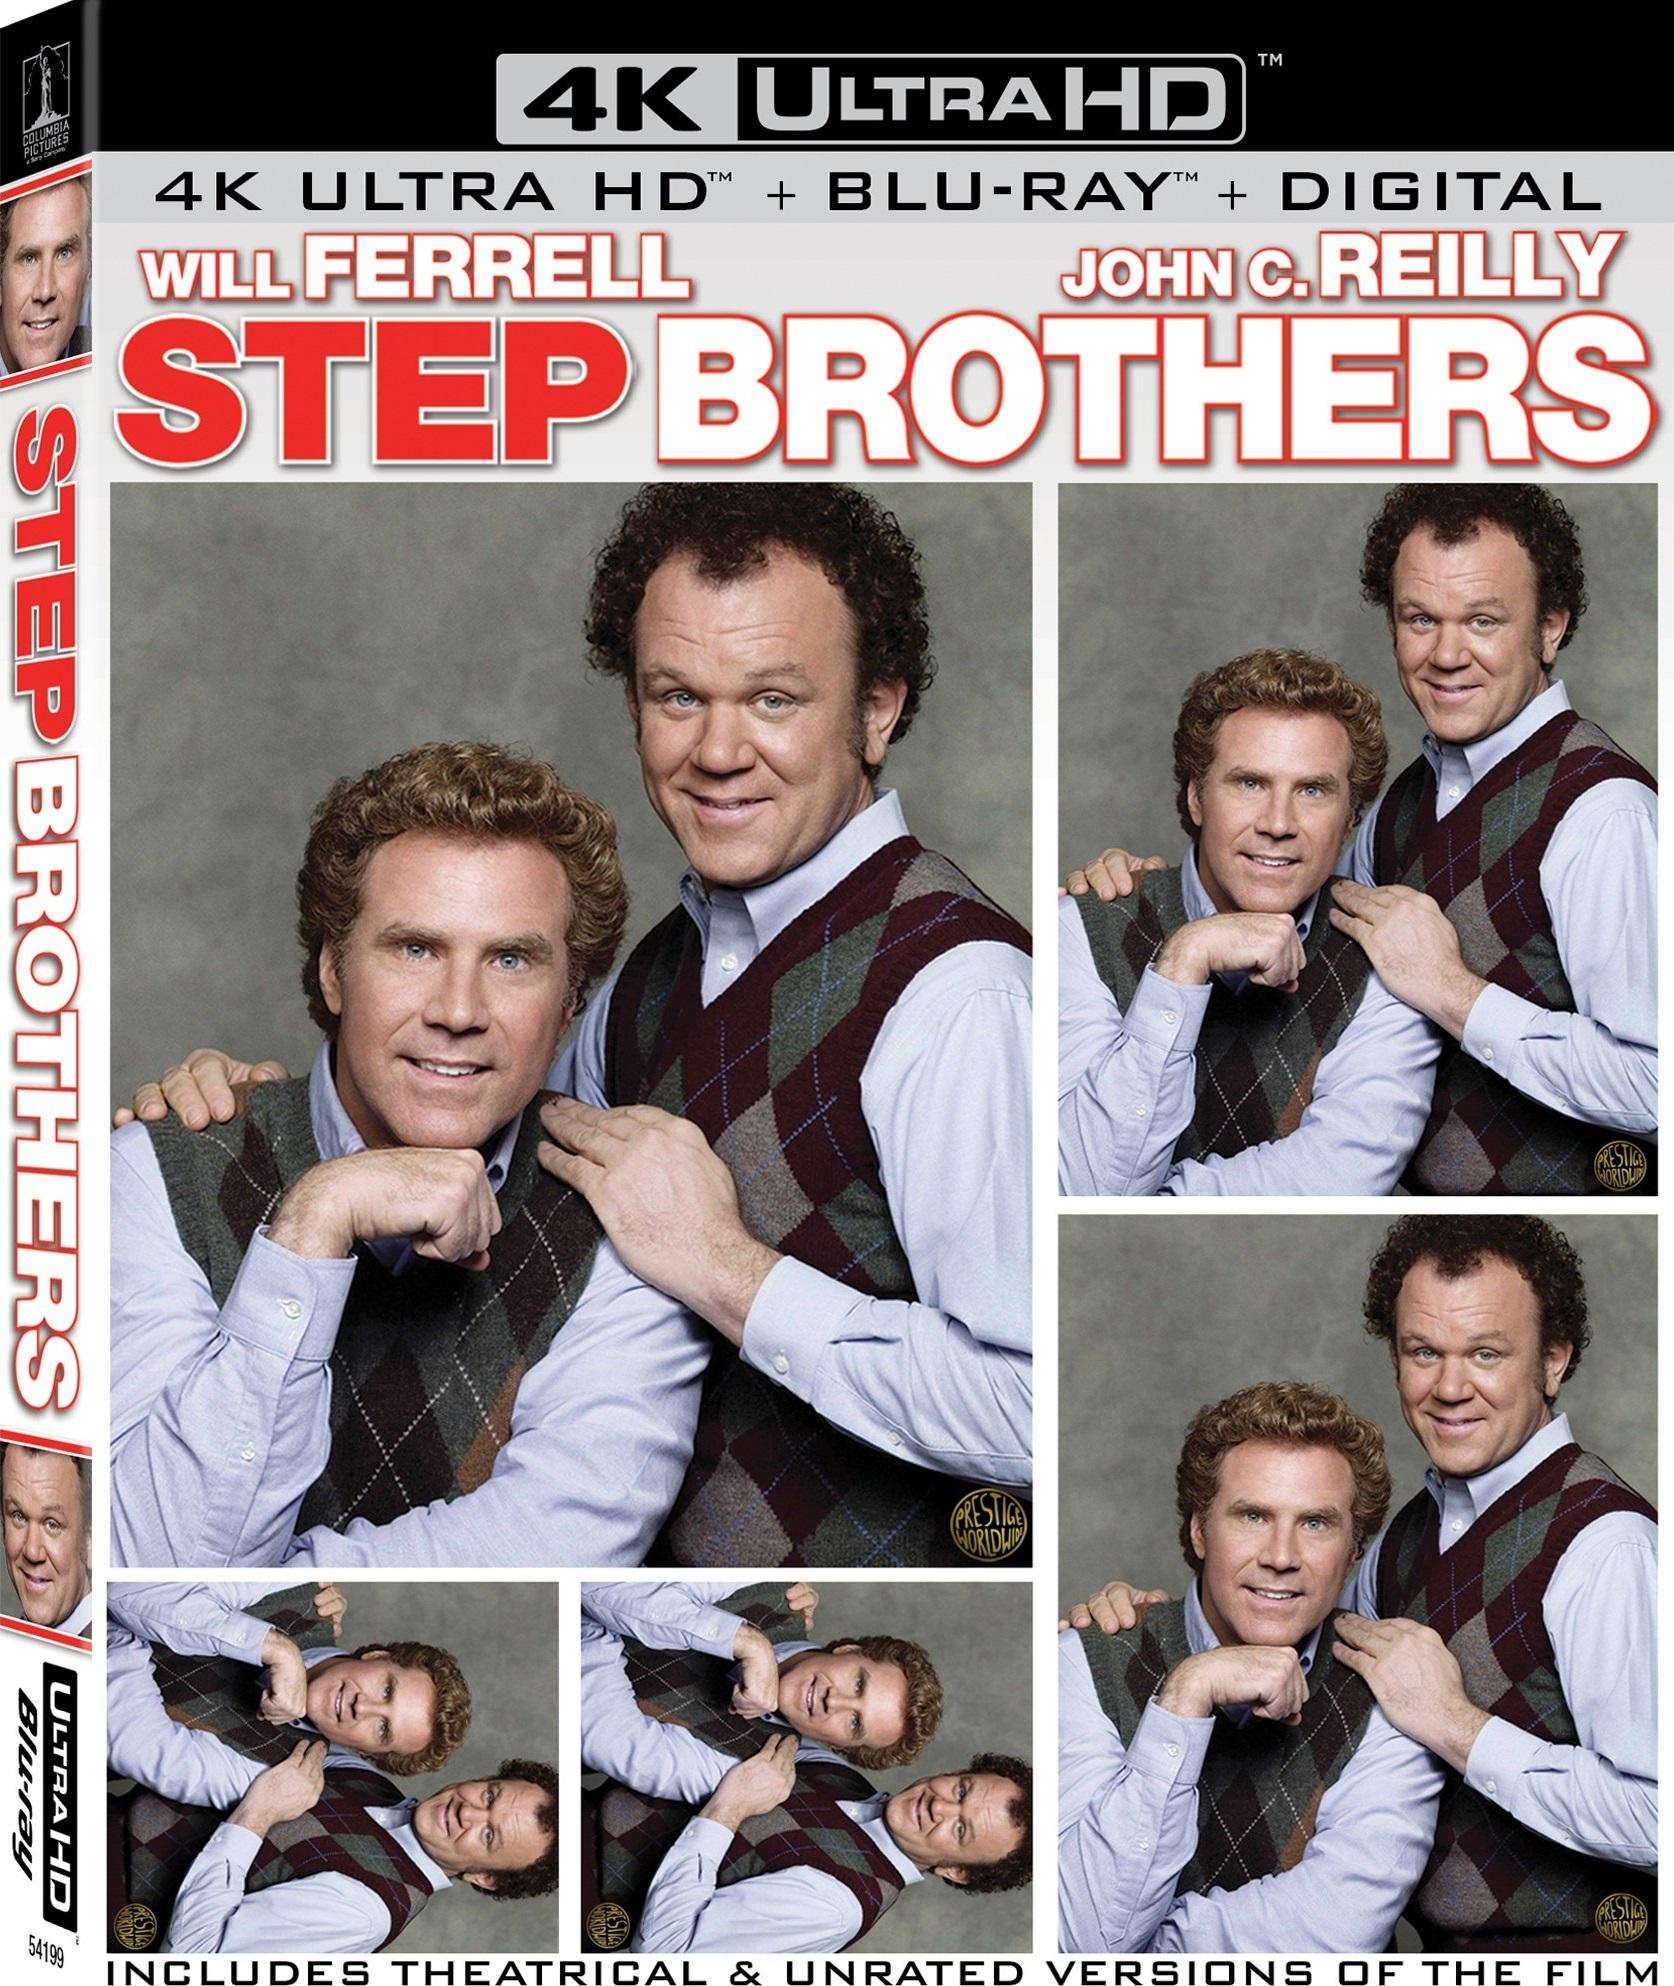 Step Brothers 4K (2008) Ultra HD Blu-ray